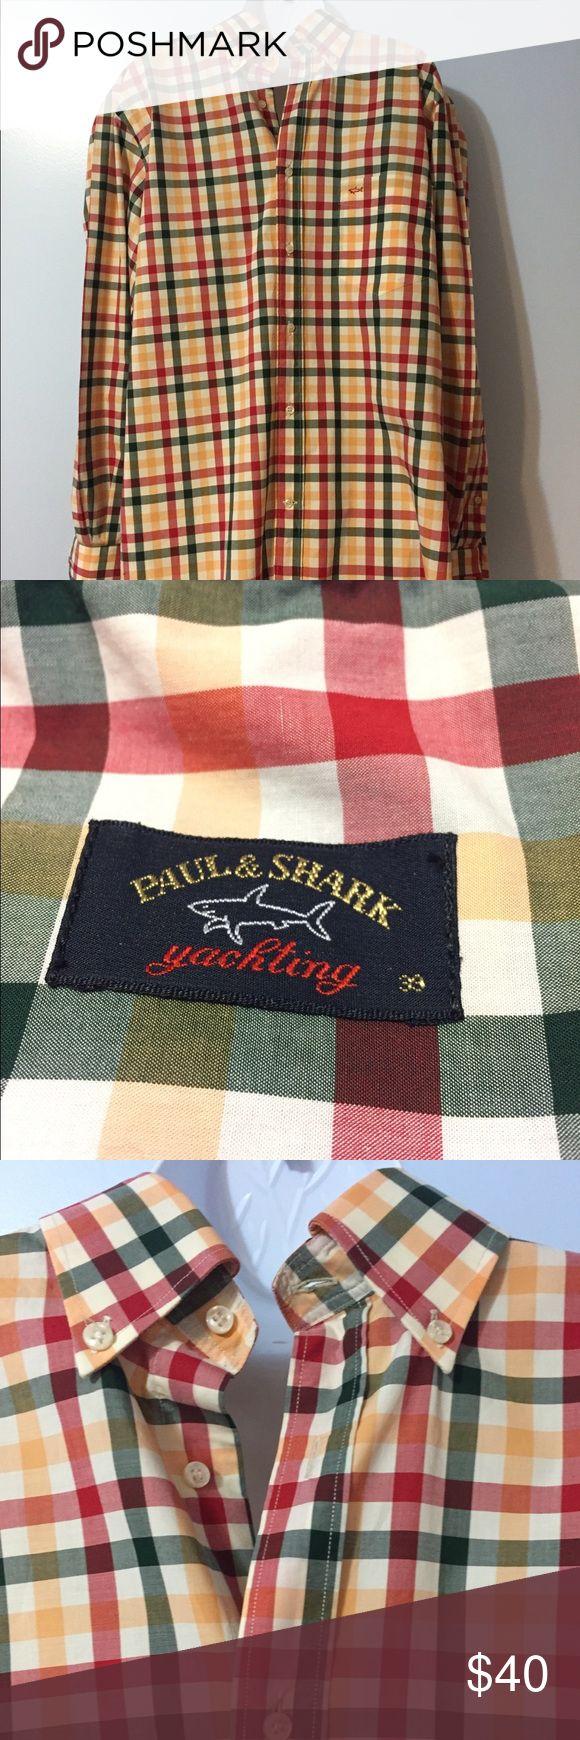 "Paul & Shark Plaid L/S Shirt Euro Sz 39, US Med Paul & Shark Yachting orange plaid long sleeve shirt, button down collar, euro size 39, US size medium, chest 23"", length 31"" Paul & Shark Shirts Casual Button Down Shirts"